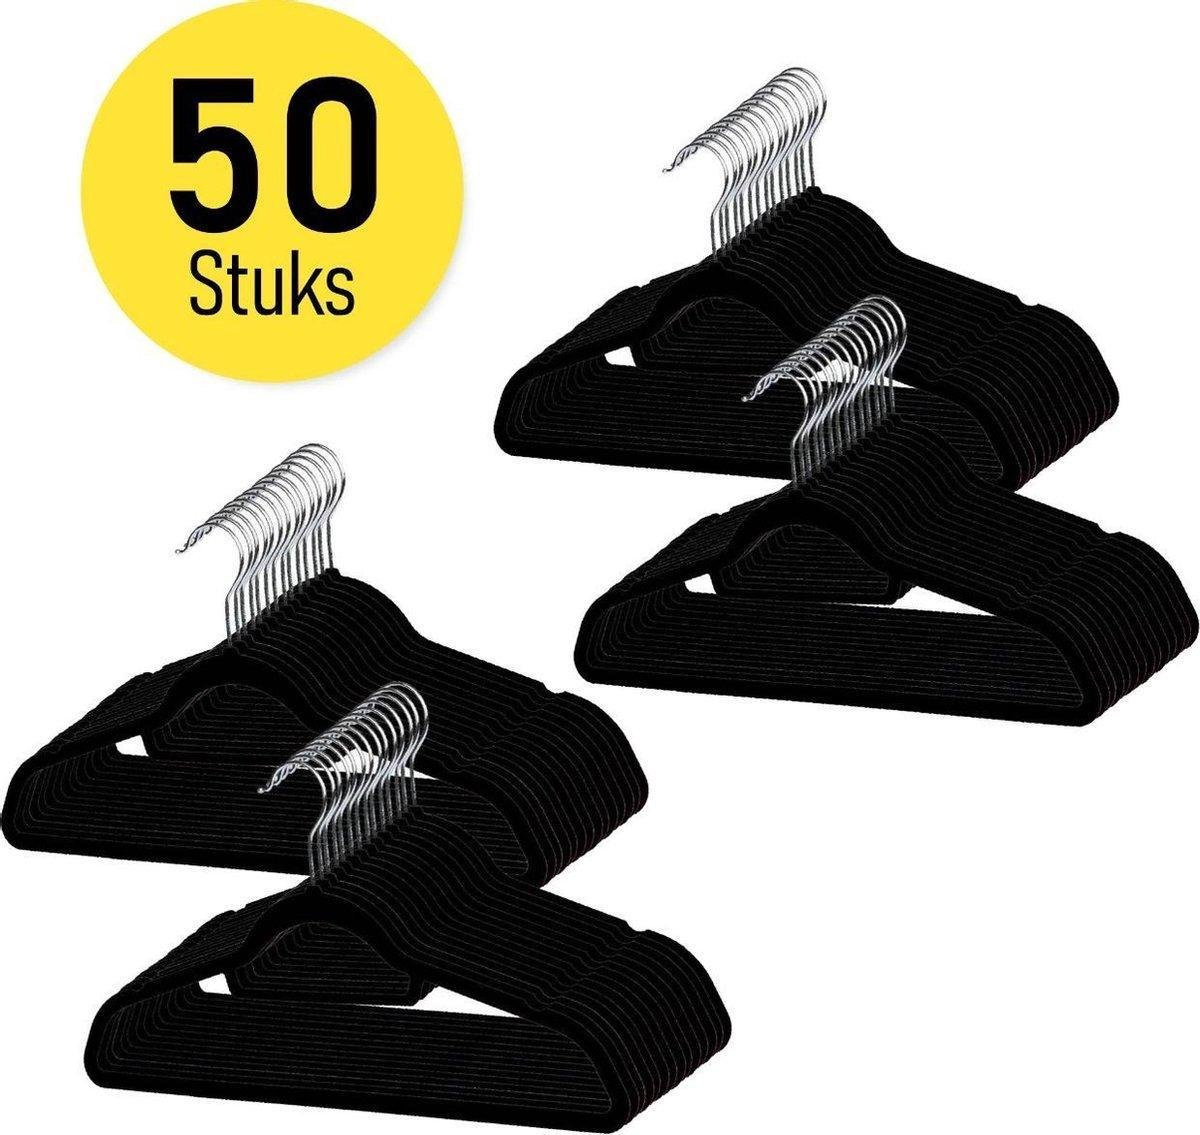 Anti-Slip Kledinghangers - Met broeklat - Zwart - 50 Stuks